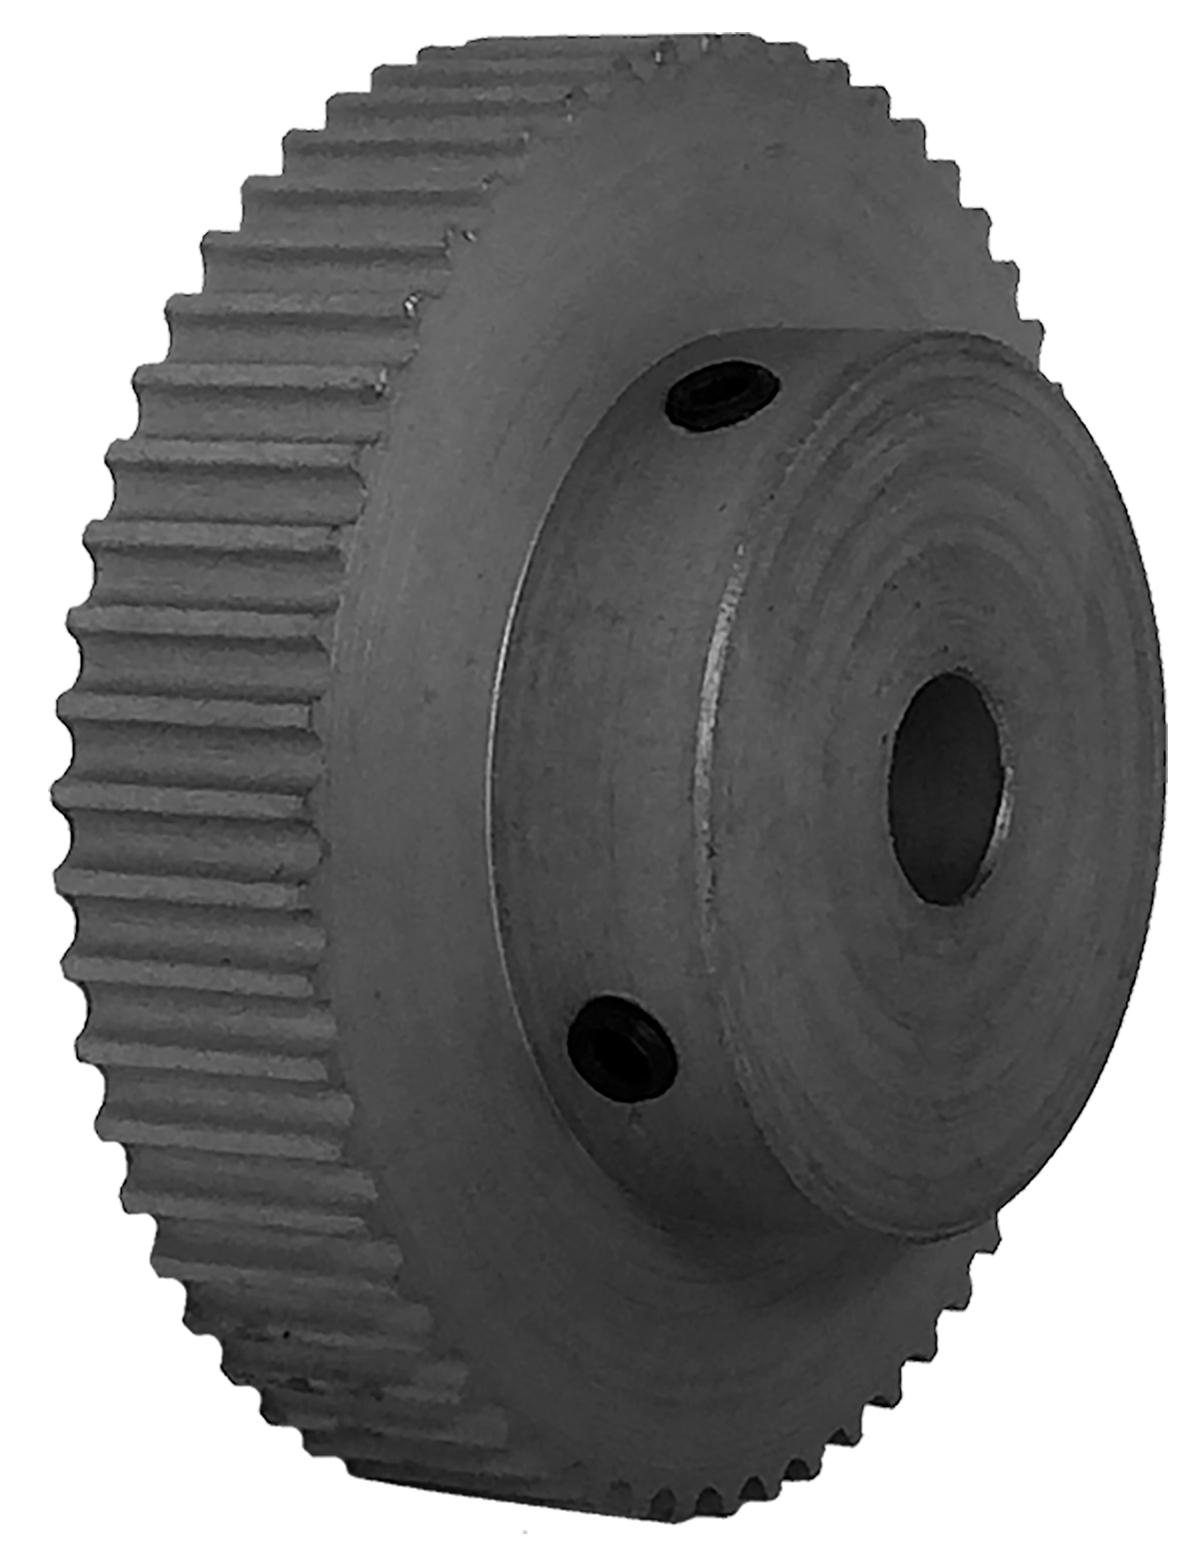 56-3P06-6A4 - Aluminum Powerhouse® Pulleys